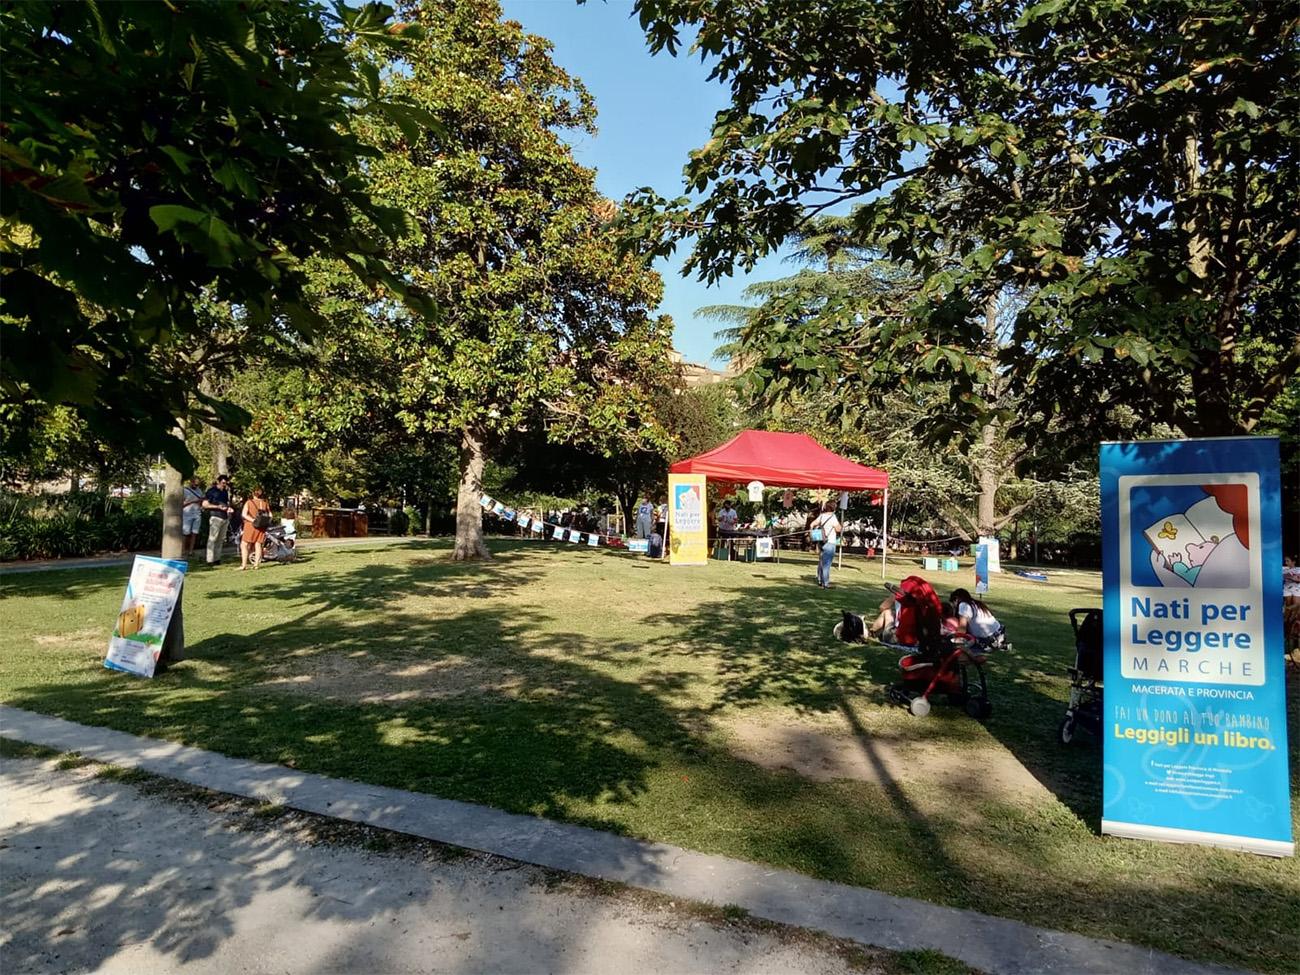 Bibliovaligia, a Macerata letture all'aria aperta per bambini